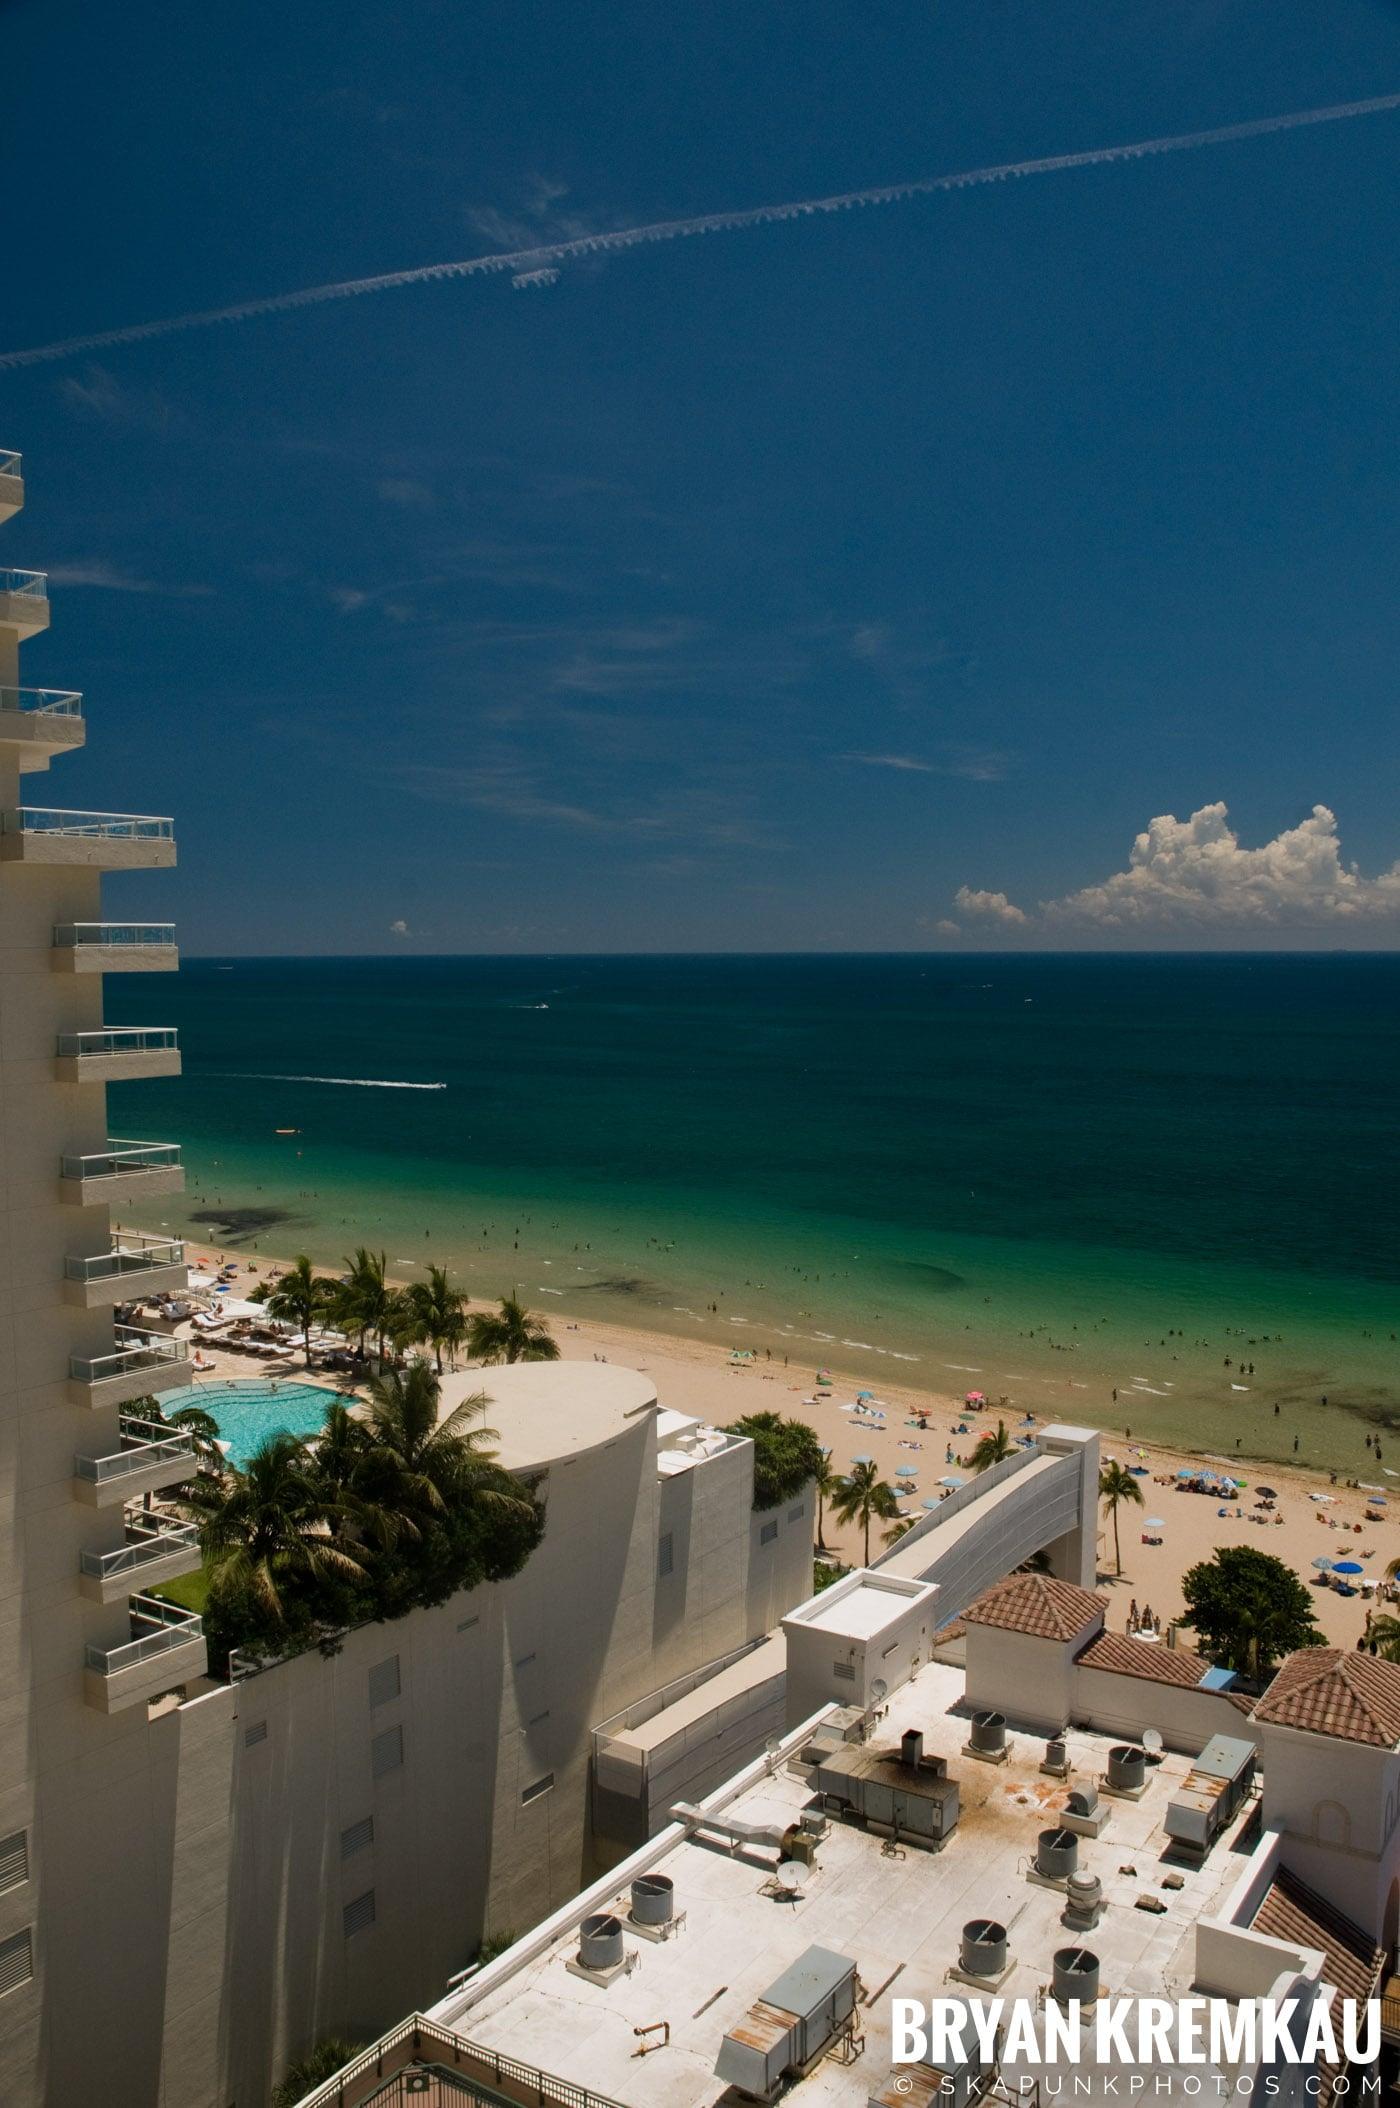 Florida Keys Vacation - 7.09.10 - 7.15.10 (108)